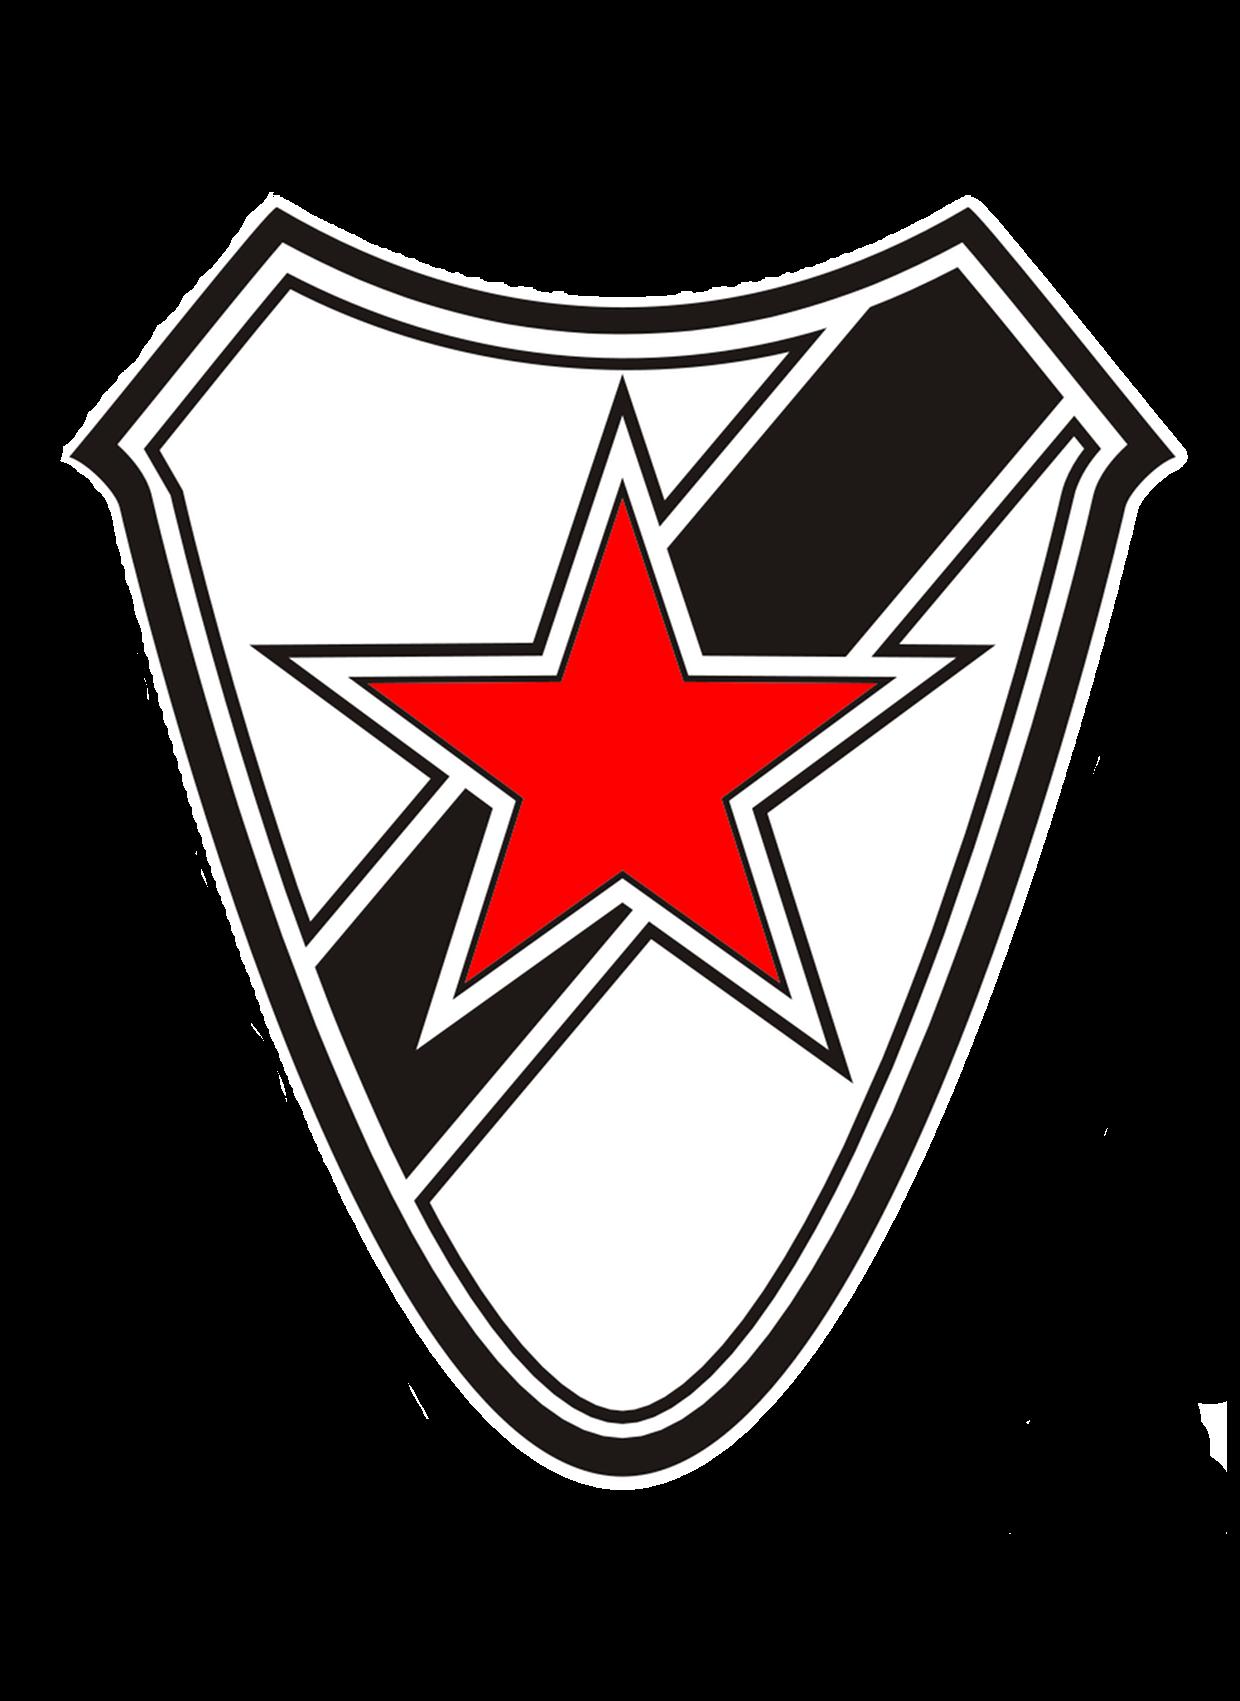 Rsl_logo